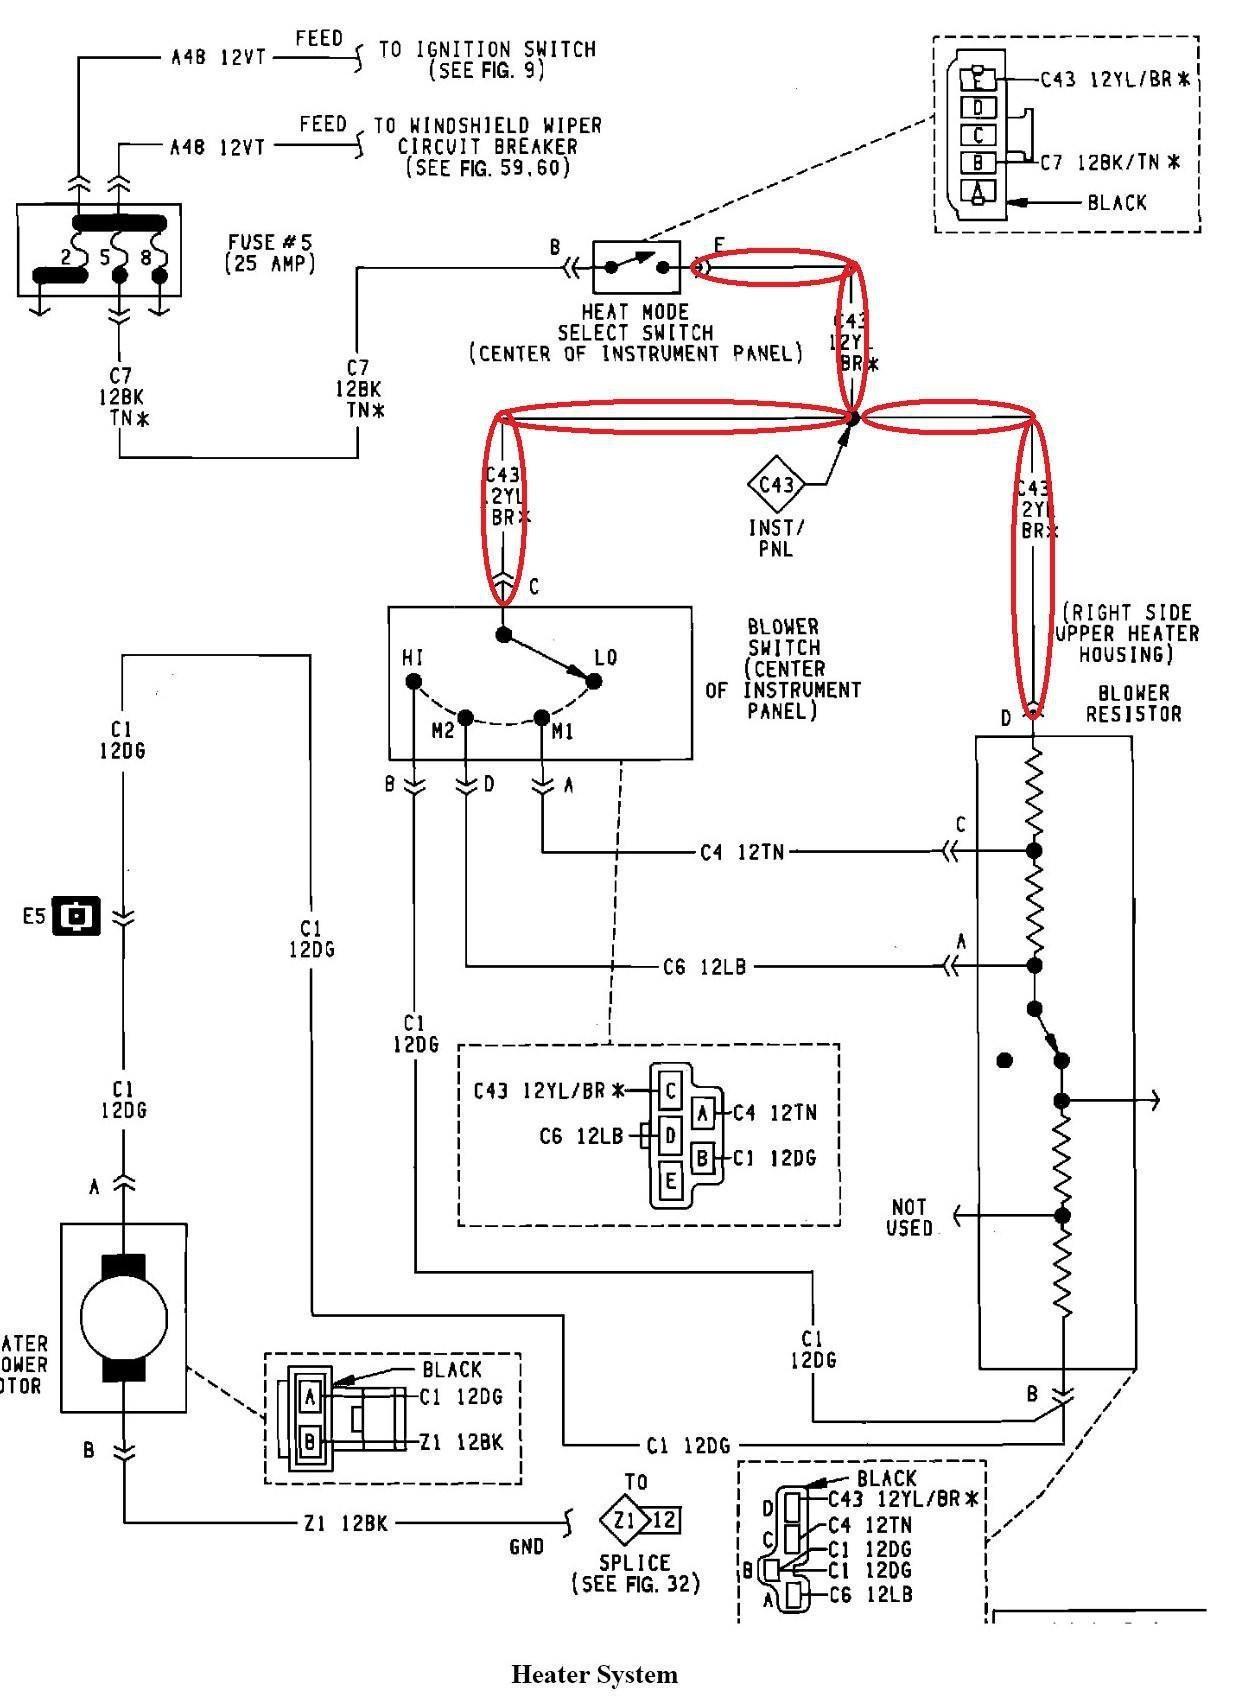 Diagram For Ez Go Golf Cart 36 Volt Battery - Wiring Diagram Explained - Ez Go Wiring Diagram 36 Volt